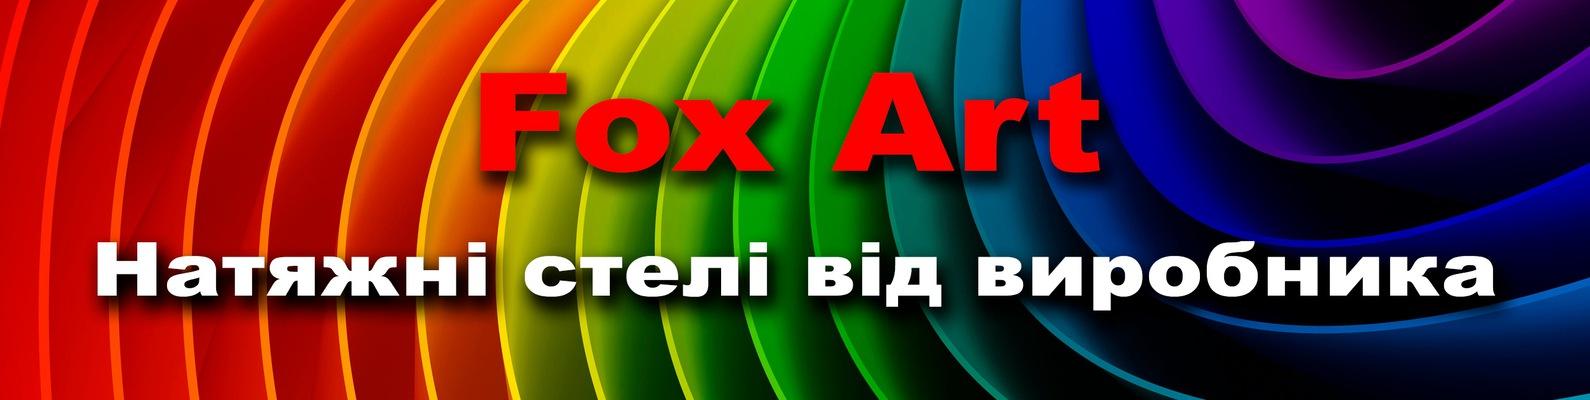 Fox Art натяжні стелі від виробника  34e186e0e9579